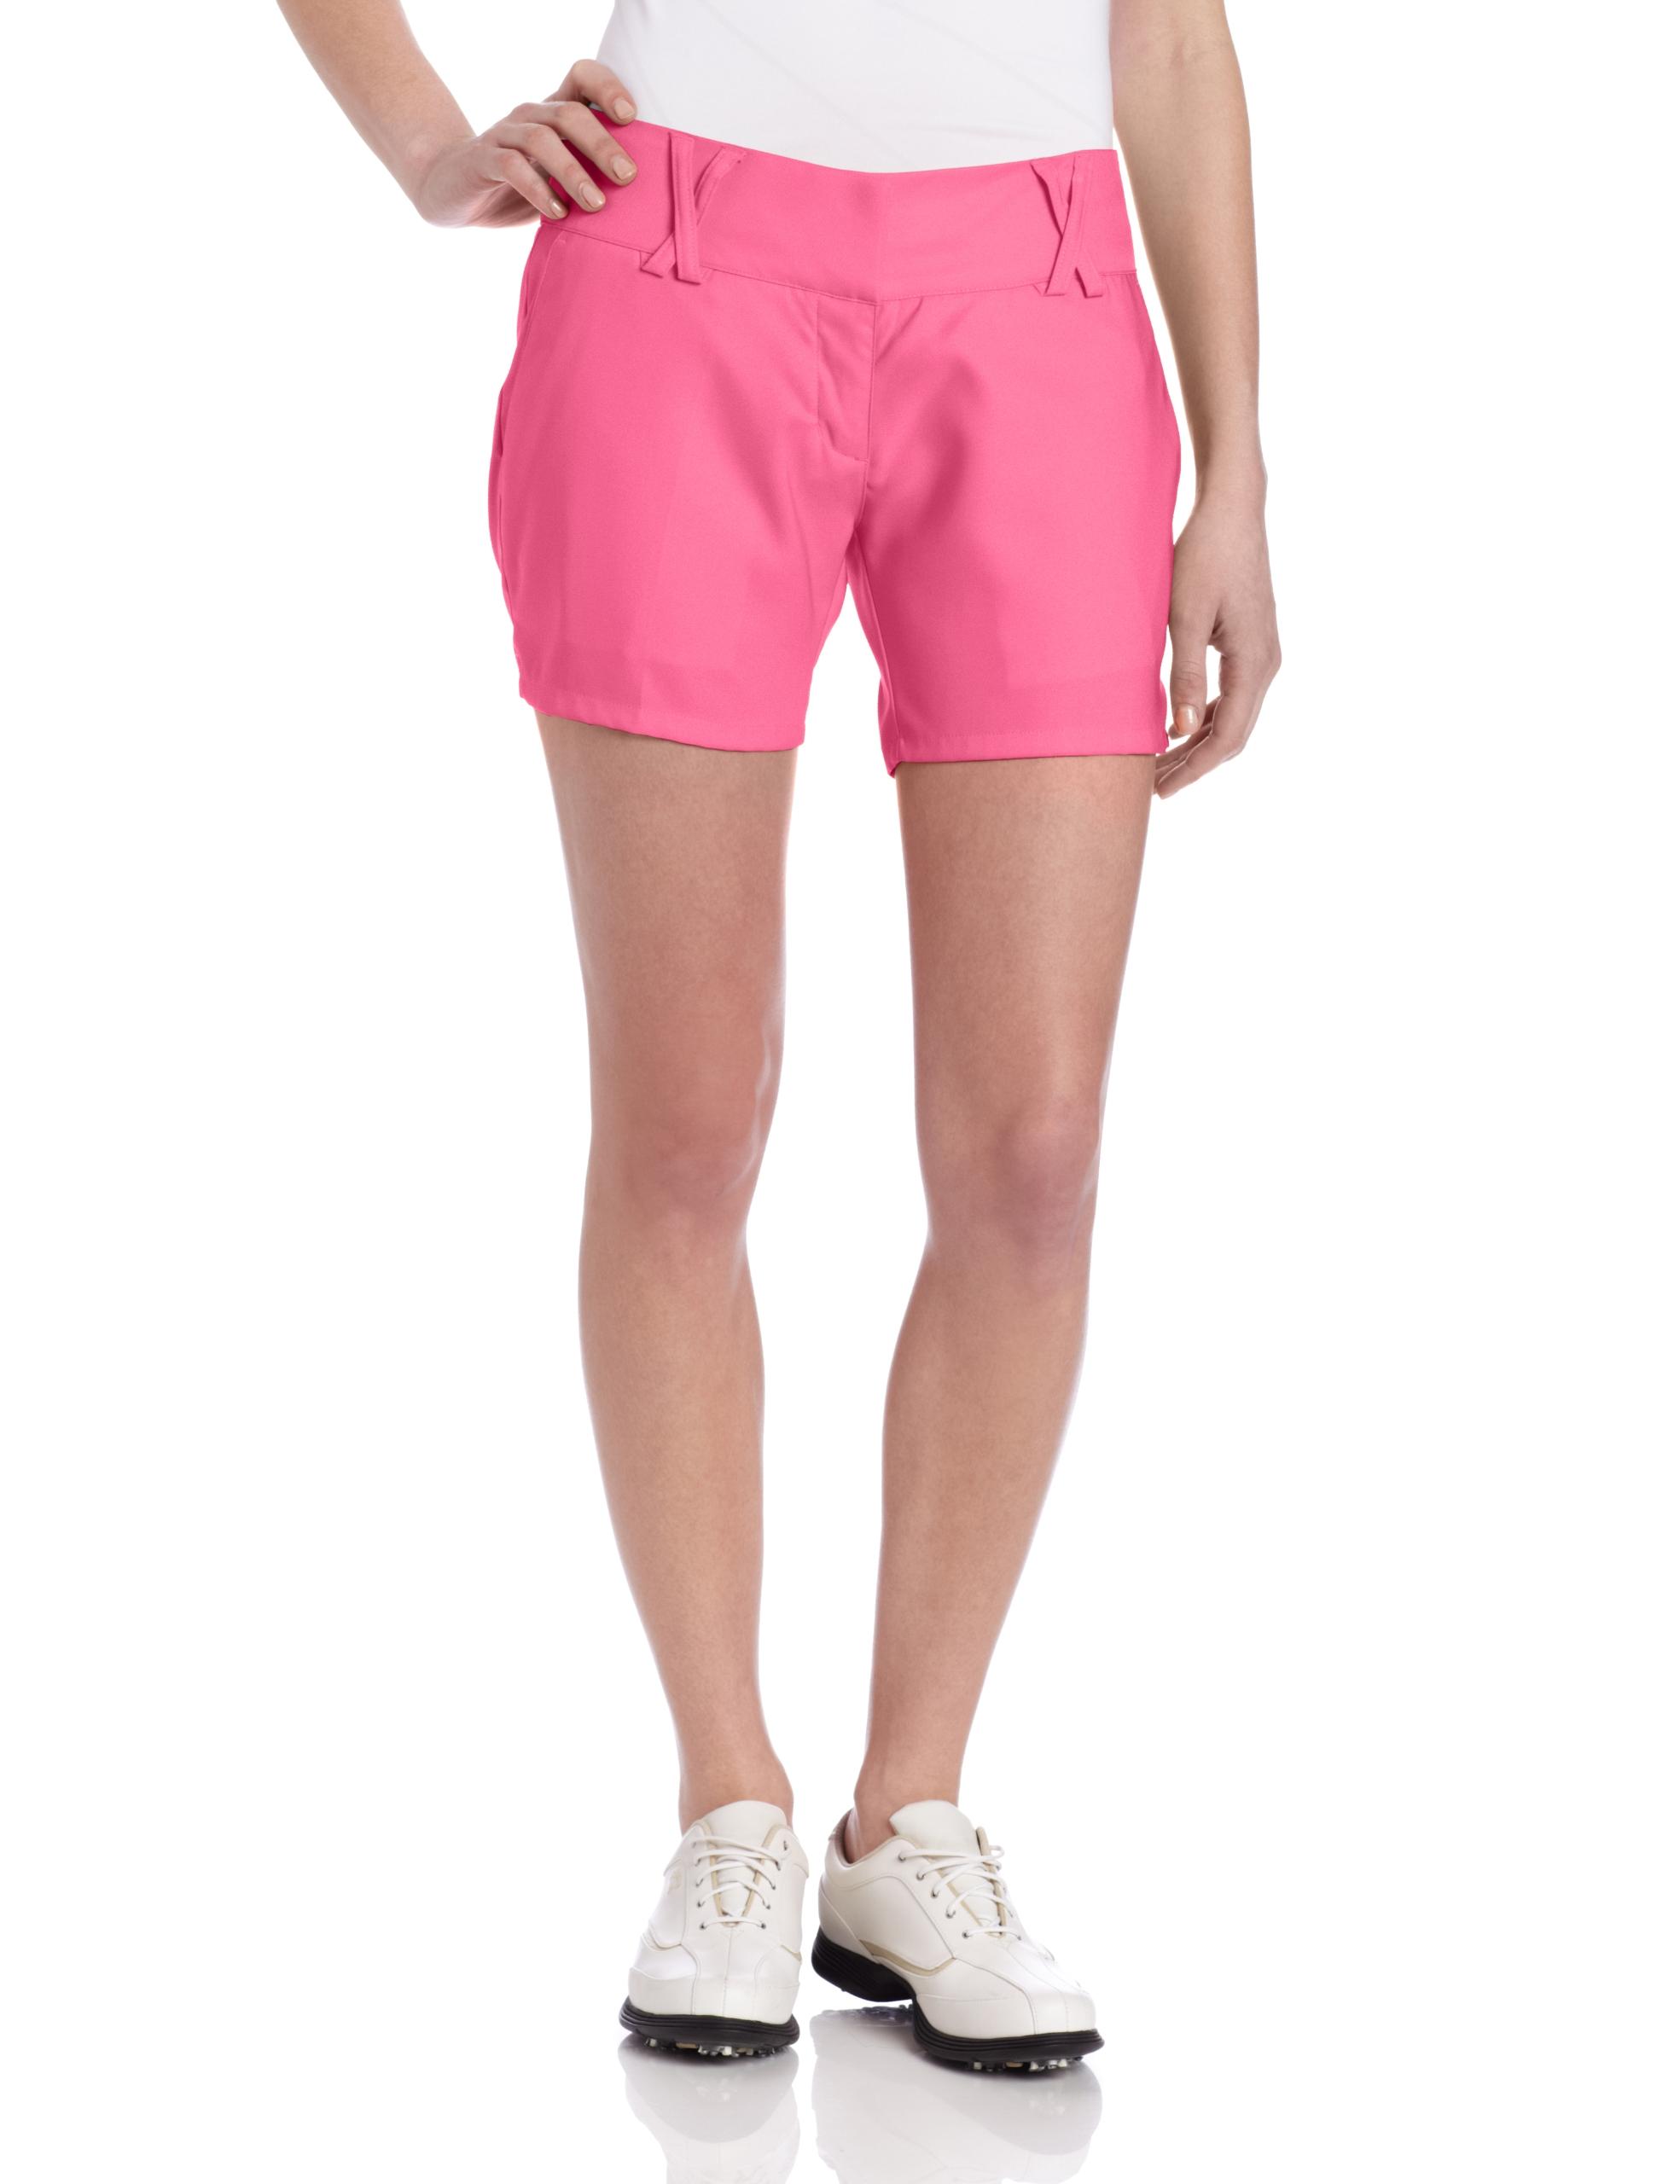 adidas Climalite Stretch Novelty Short, 10-Inch, Bubblegum